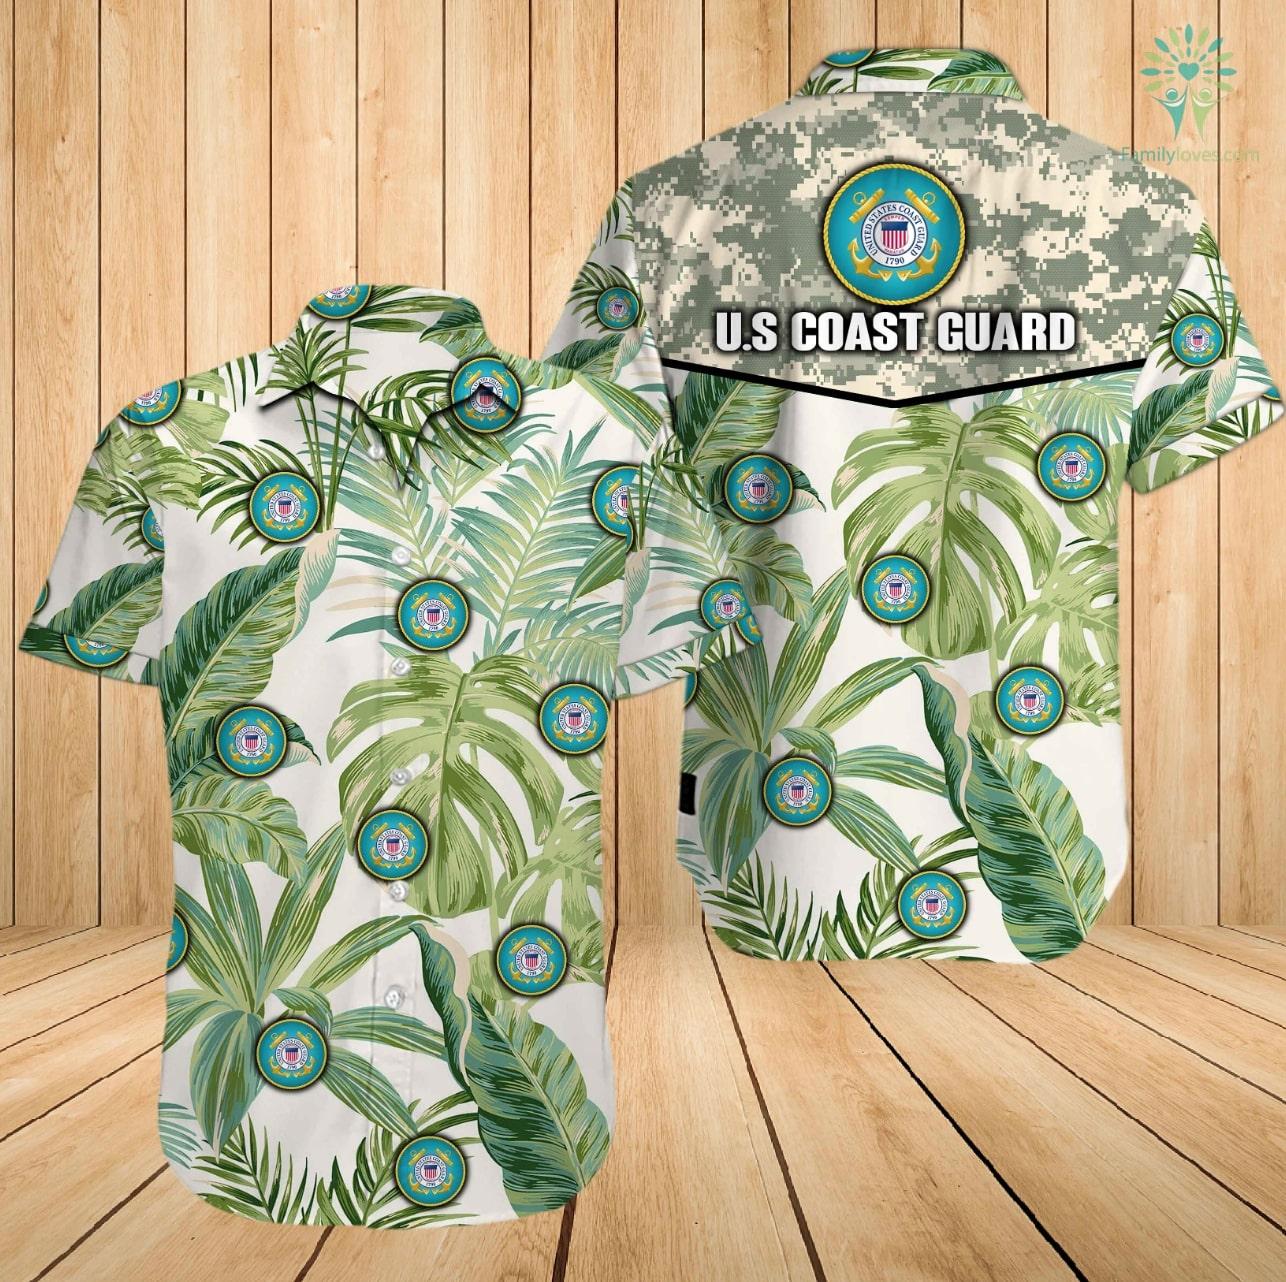 US coast guard all over printed hawaiian shirt 2